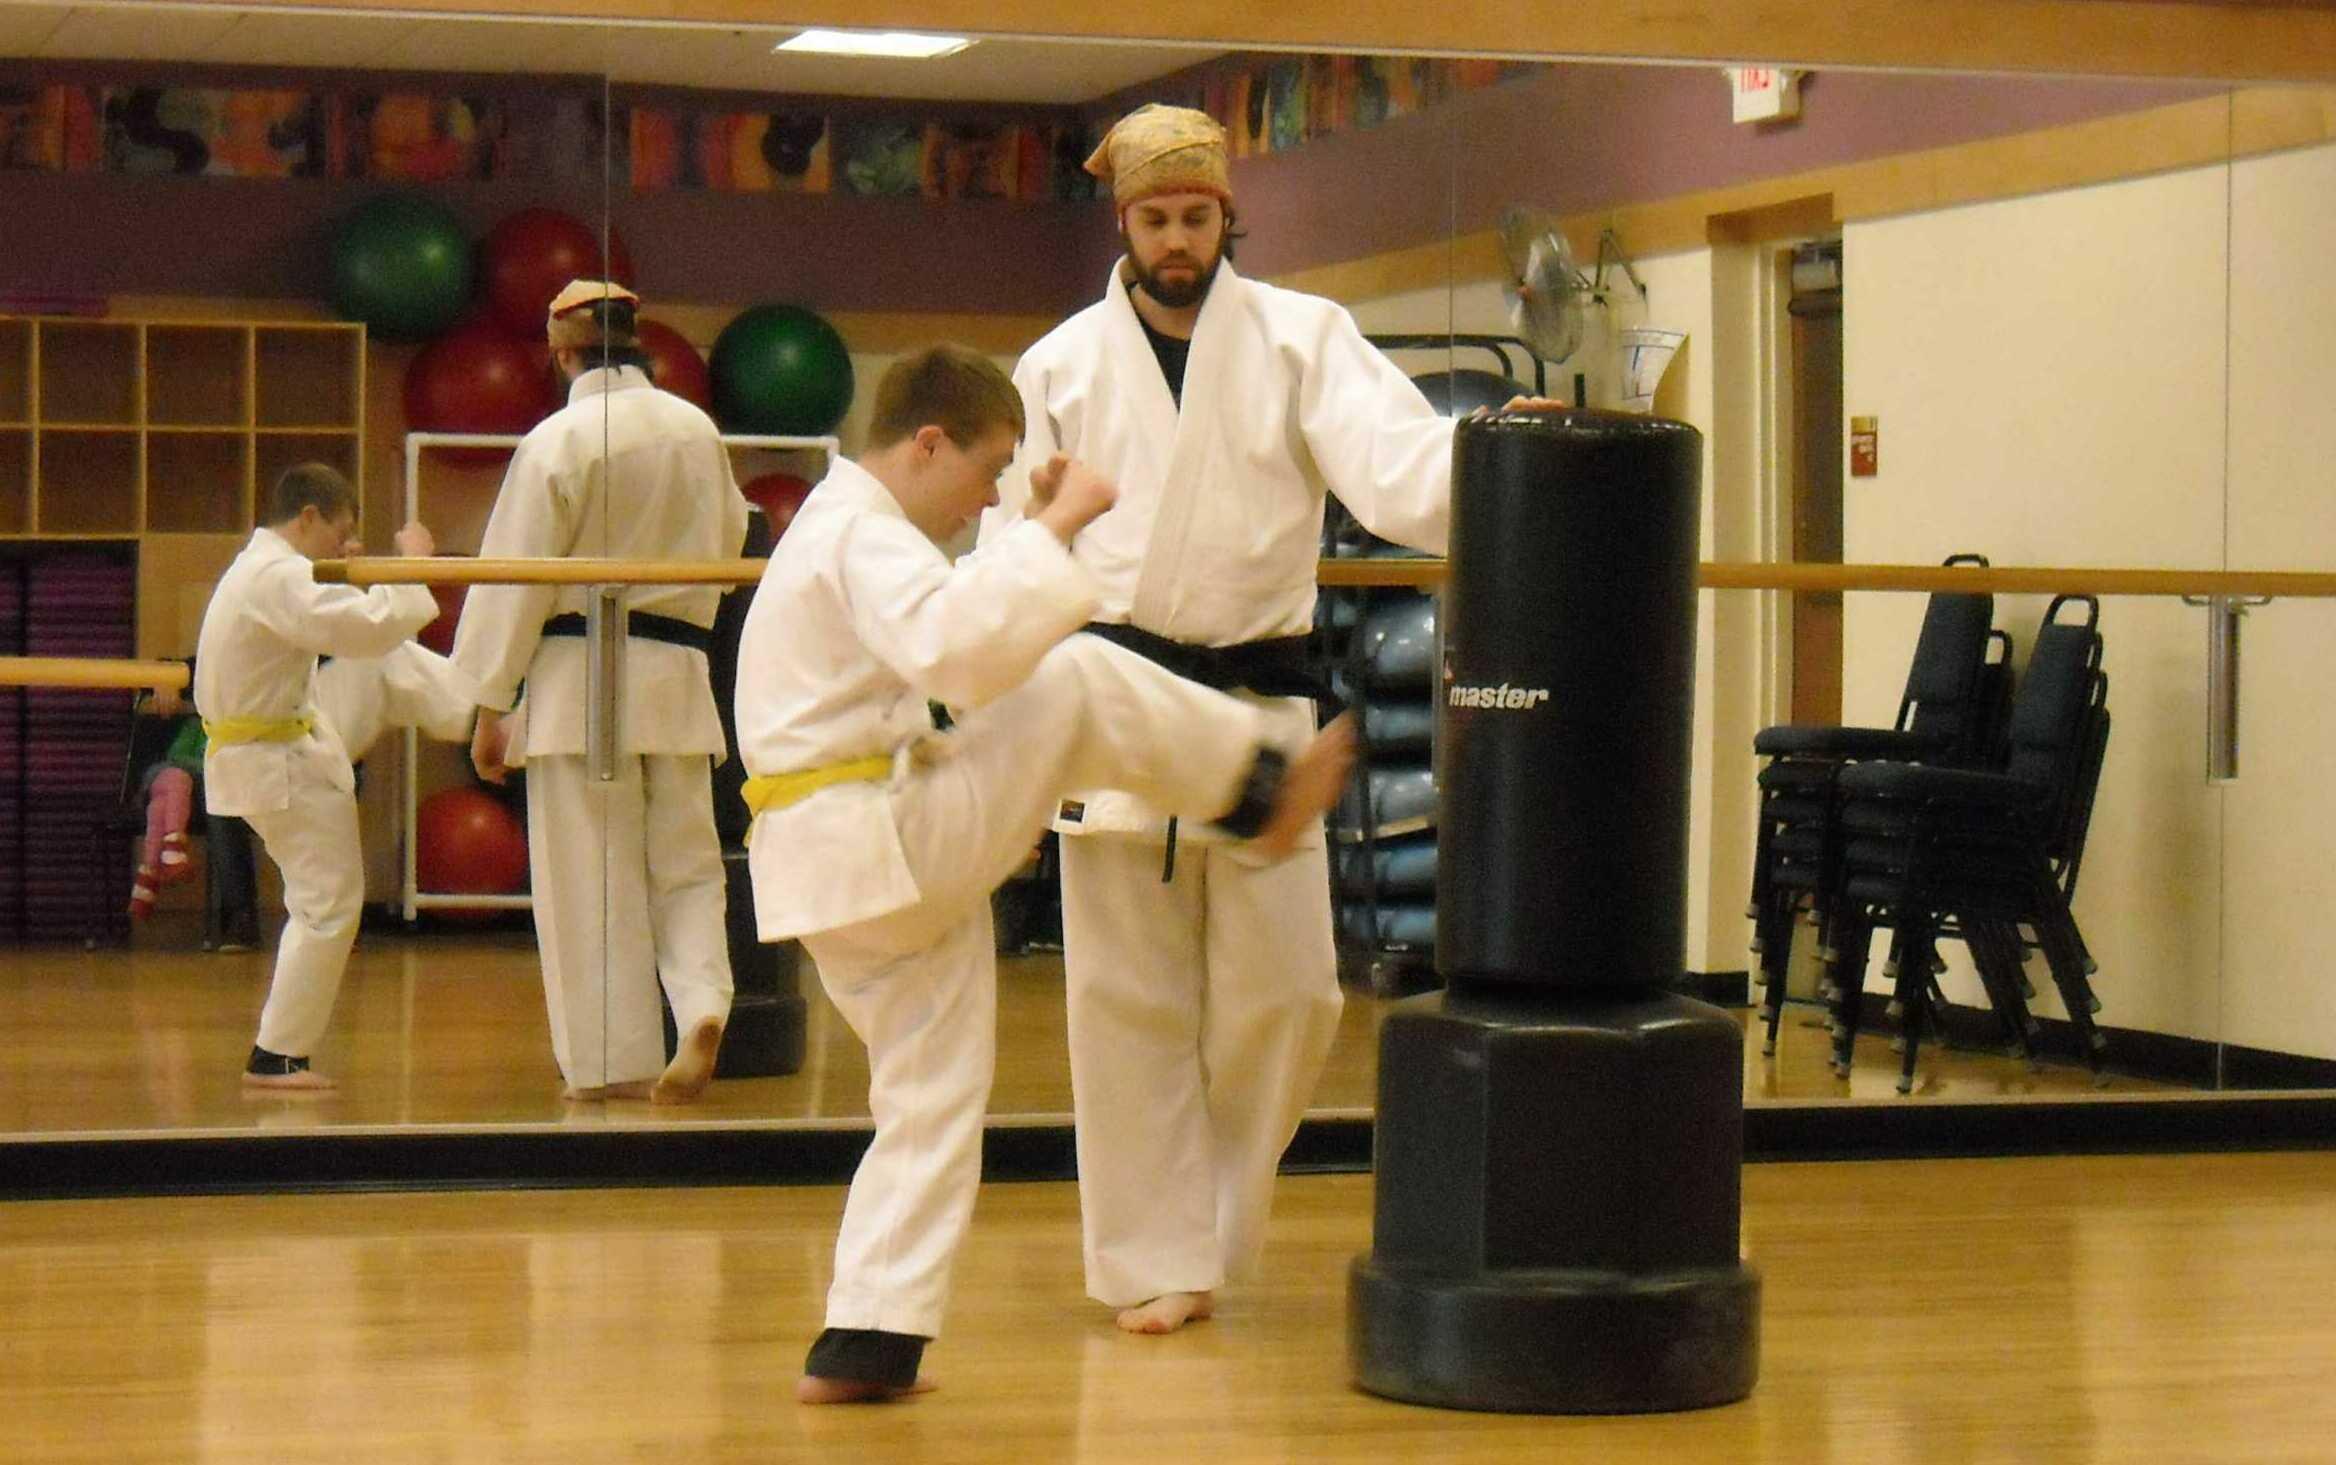 Phillip_Karate#1